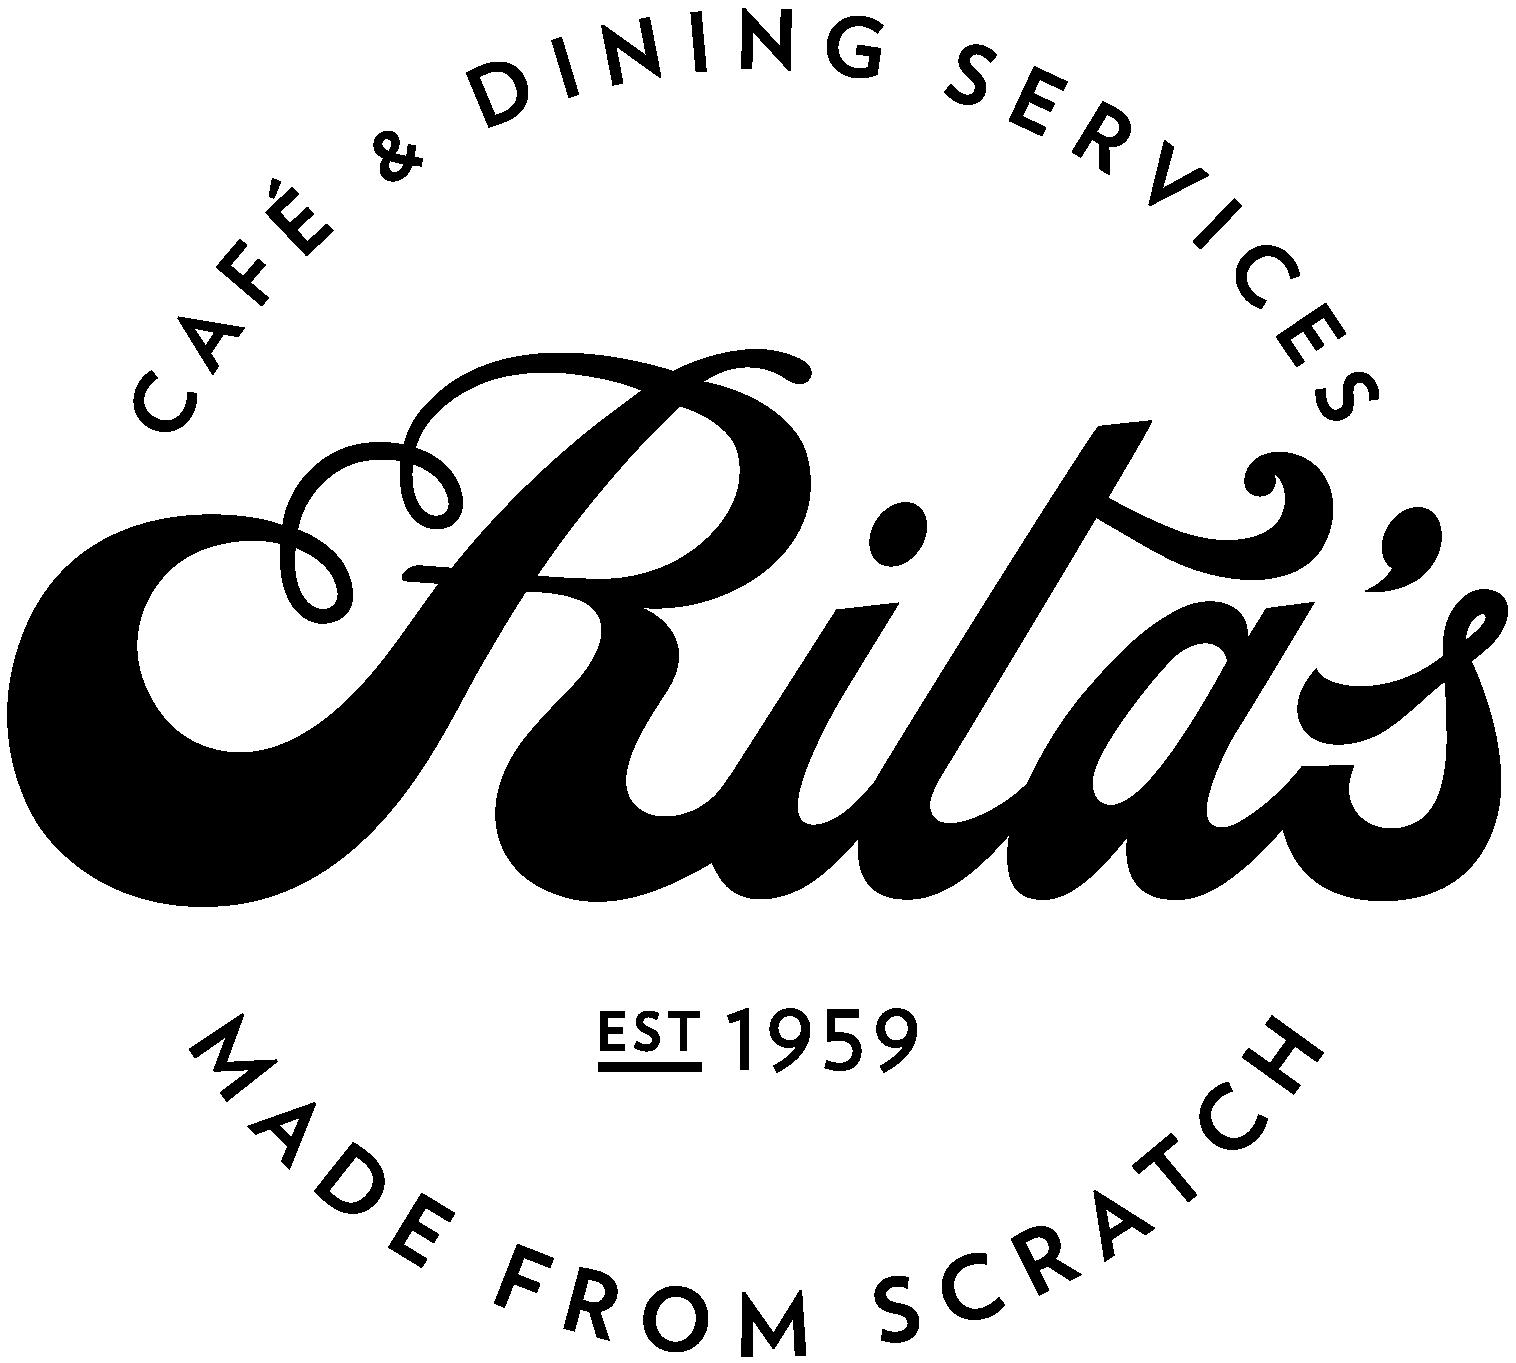 Cafe_services_logo.png